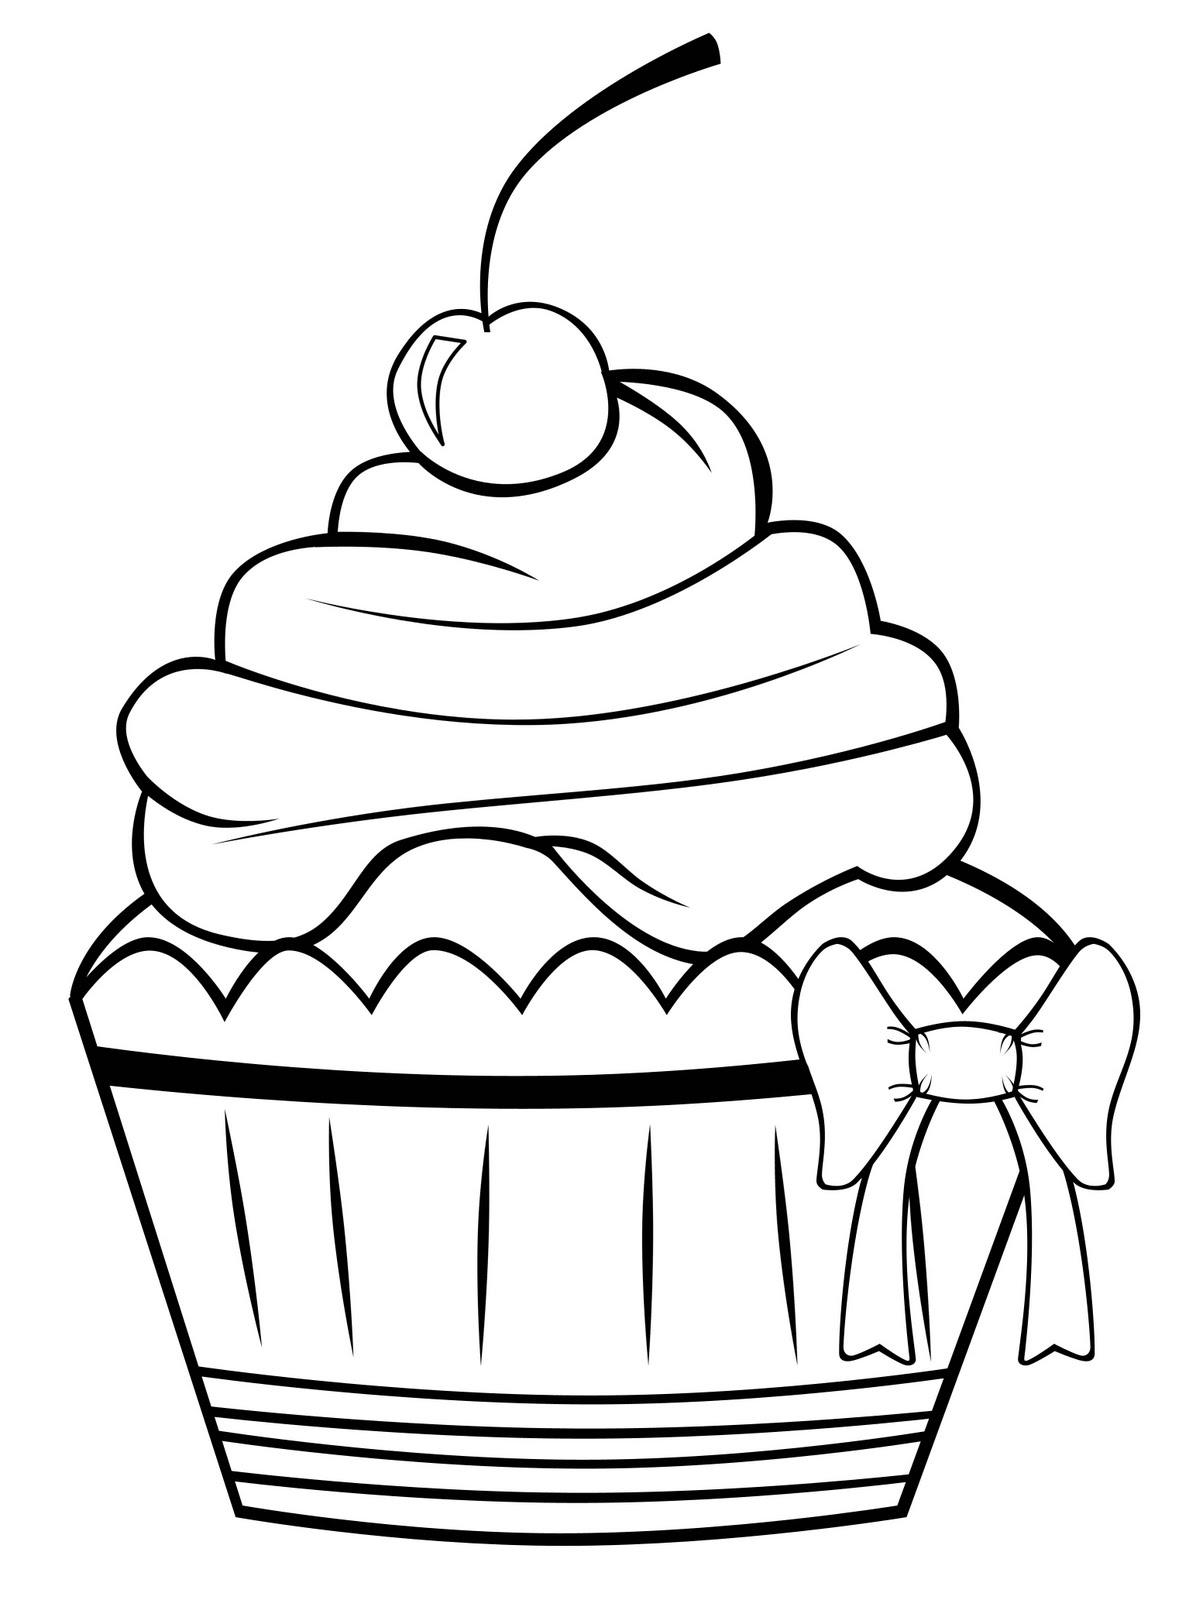 Dessin Cupcake Coloriage à Imprimer Moncupcake Fr Moncupcake Fr